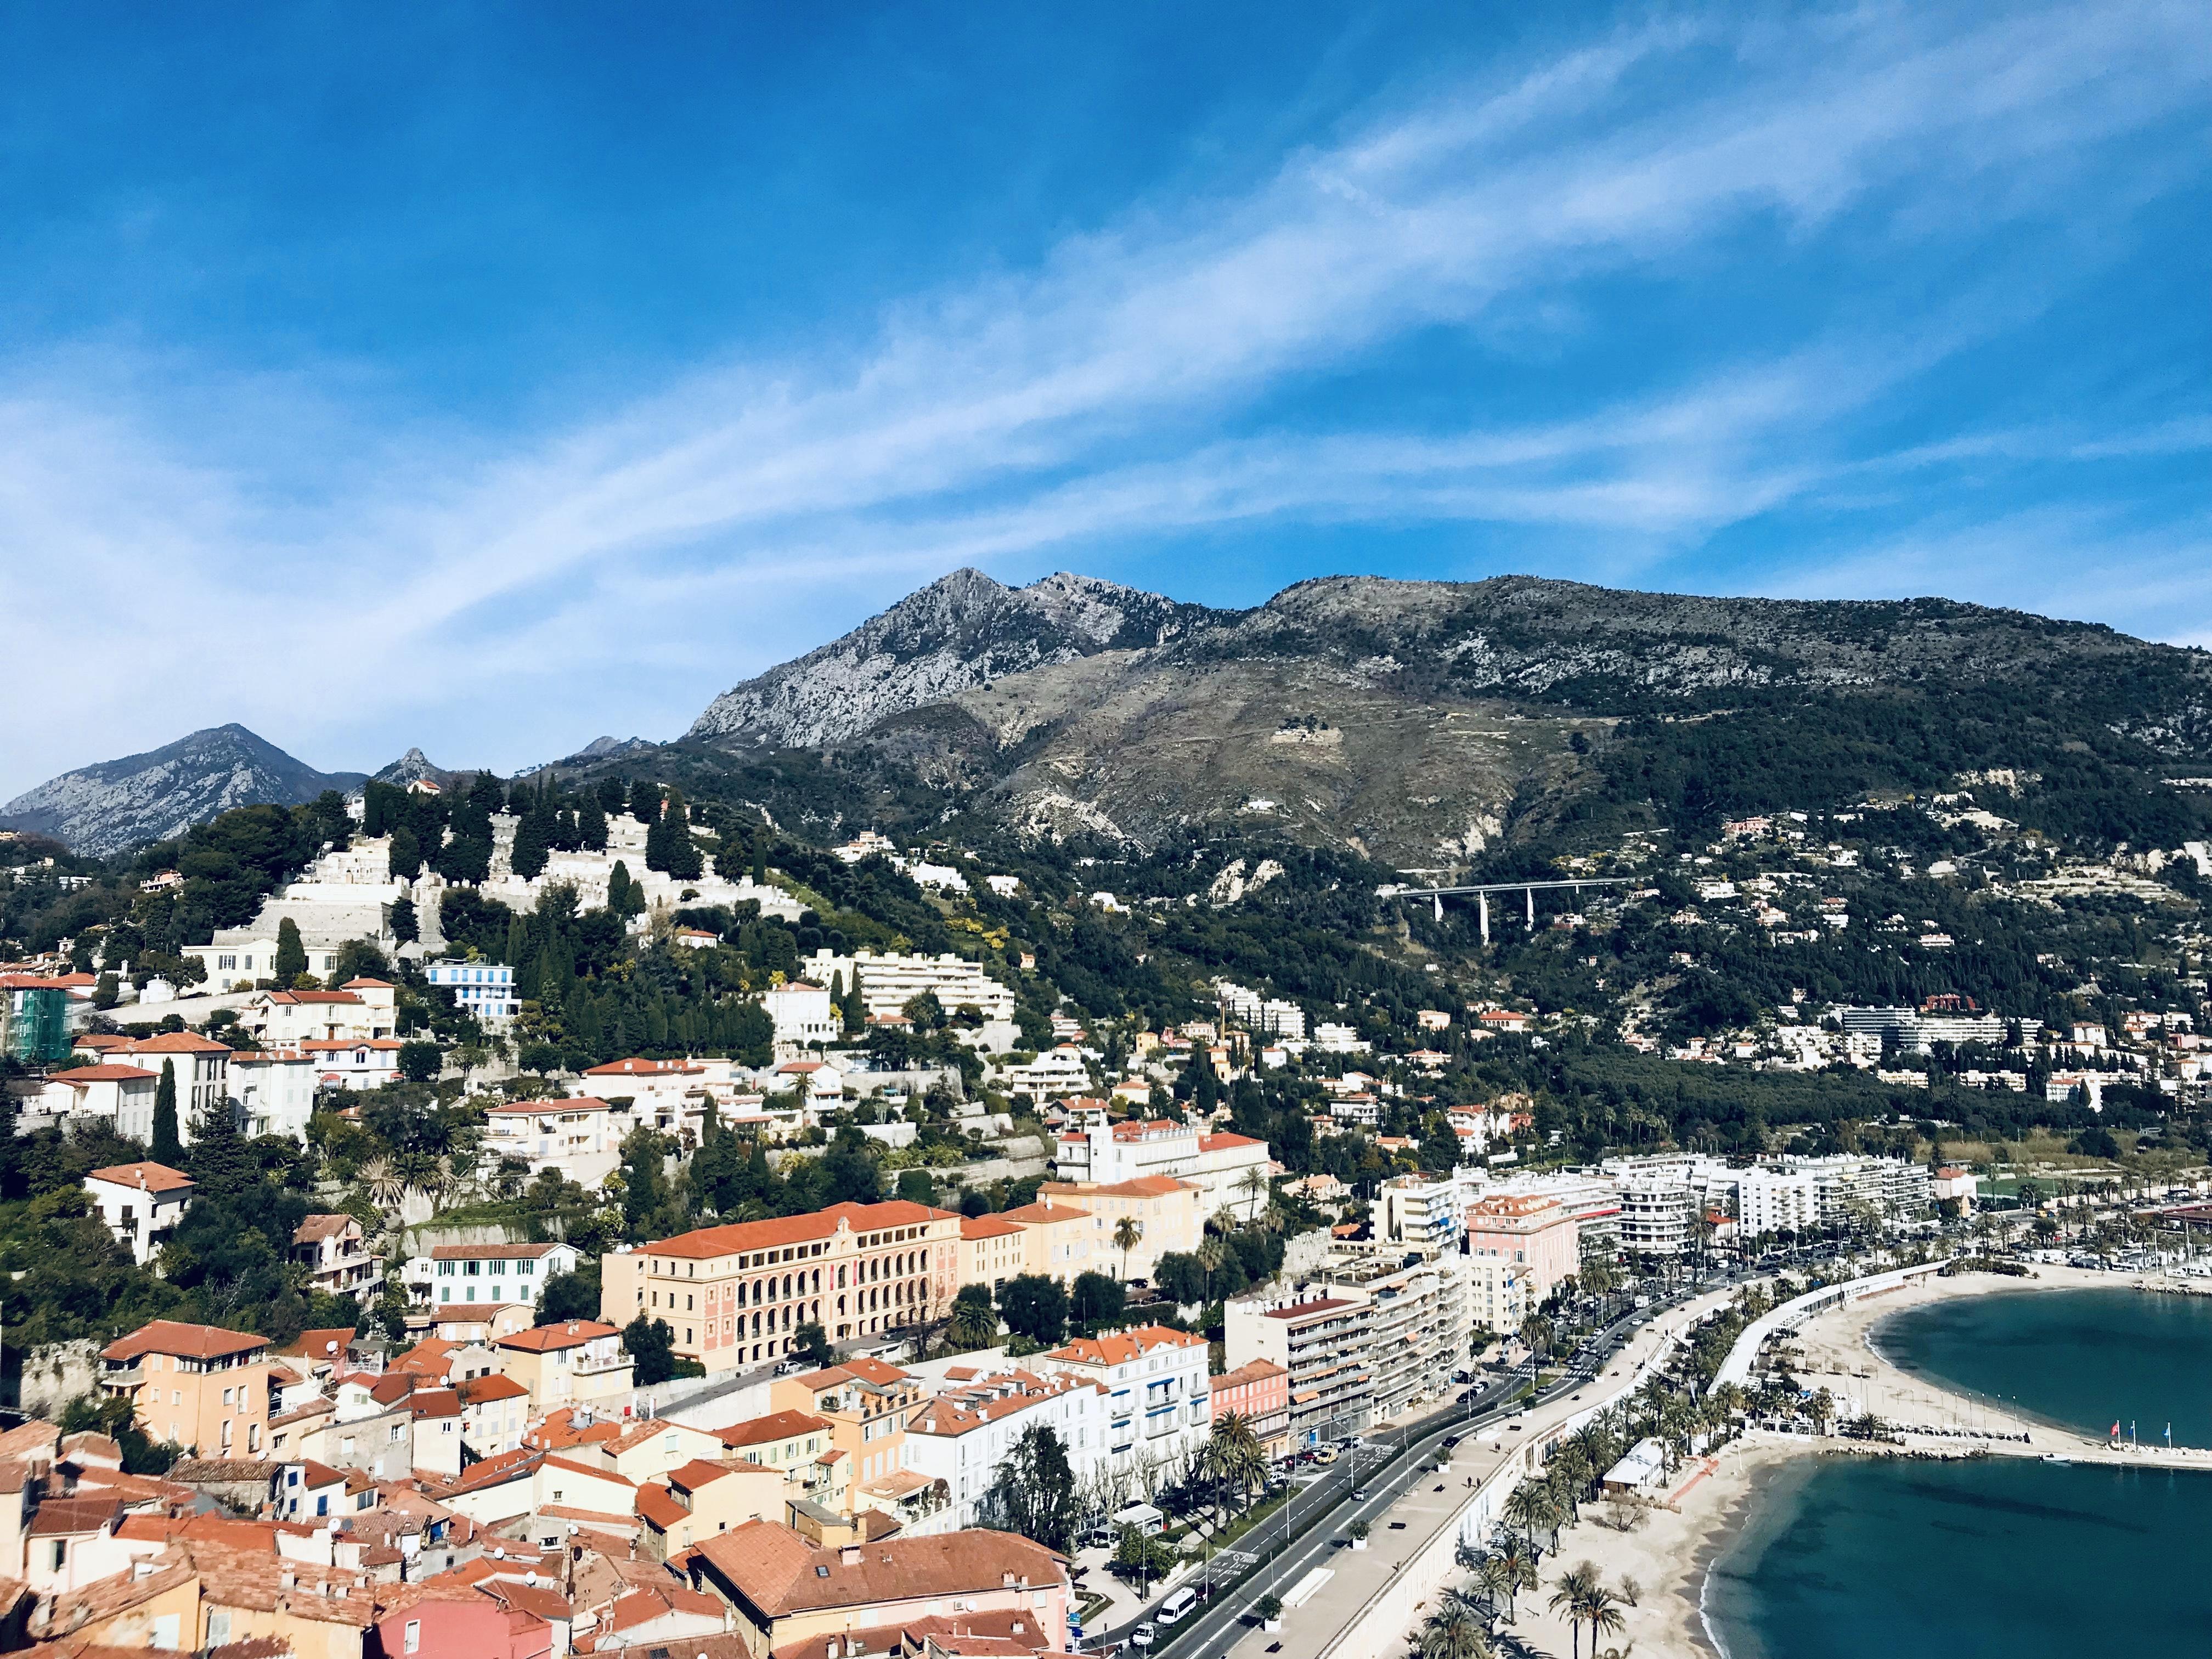 Menton French Riviera - Credit: Quality Hotel Menton Méditerranée